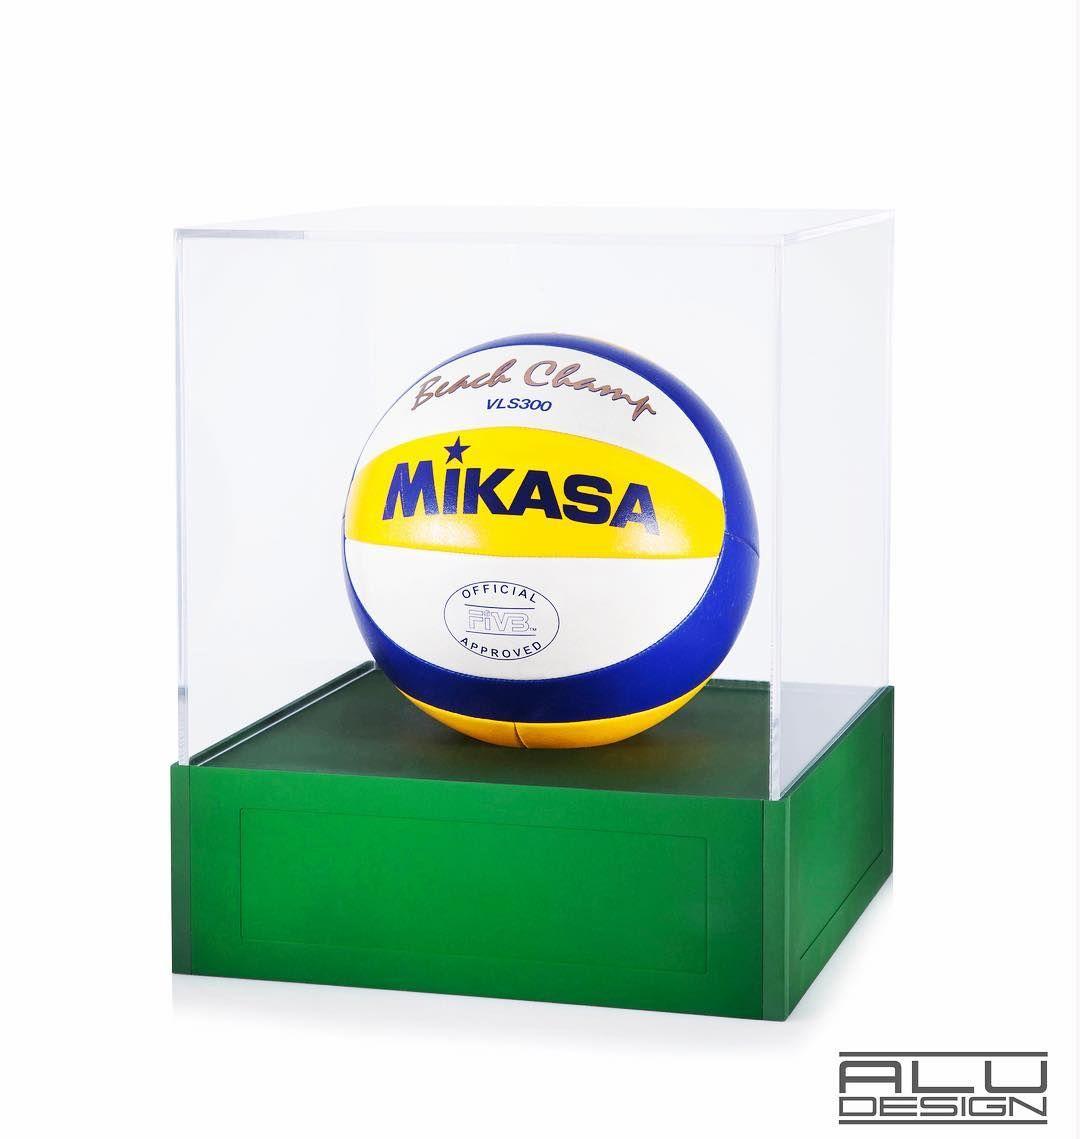 Volleyball Trophy Case Beachvolleyball Rio2016 Olympics Volleyball Voleibol Mikasa Display Case Design Volleyball